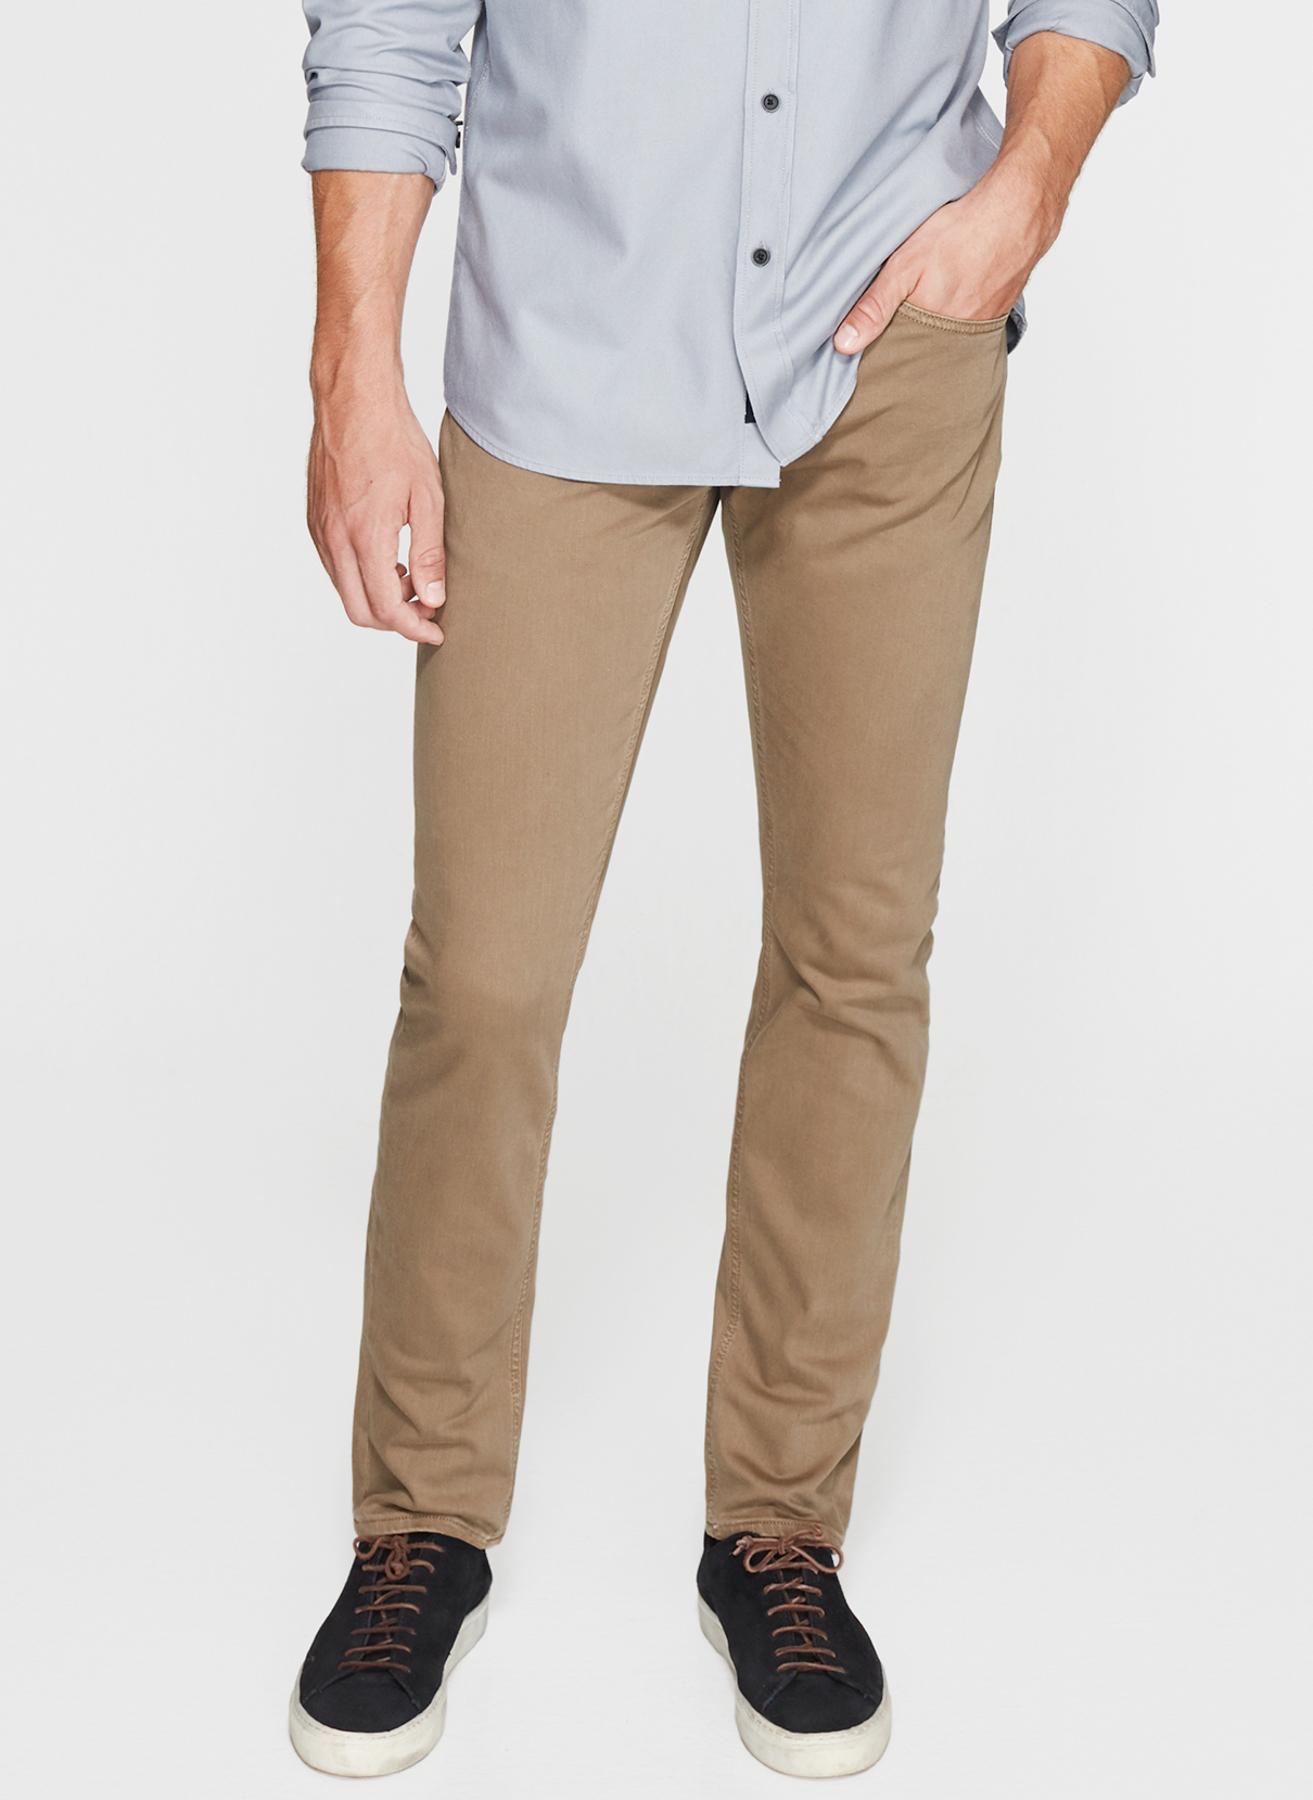 Mavi Klasik Pantolon 31-28 5001822960021 Ürün Resmi